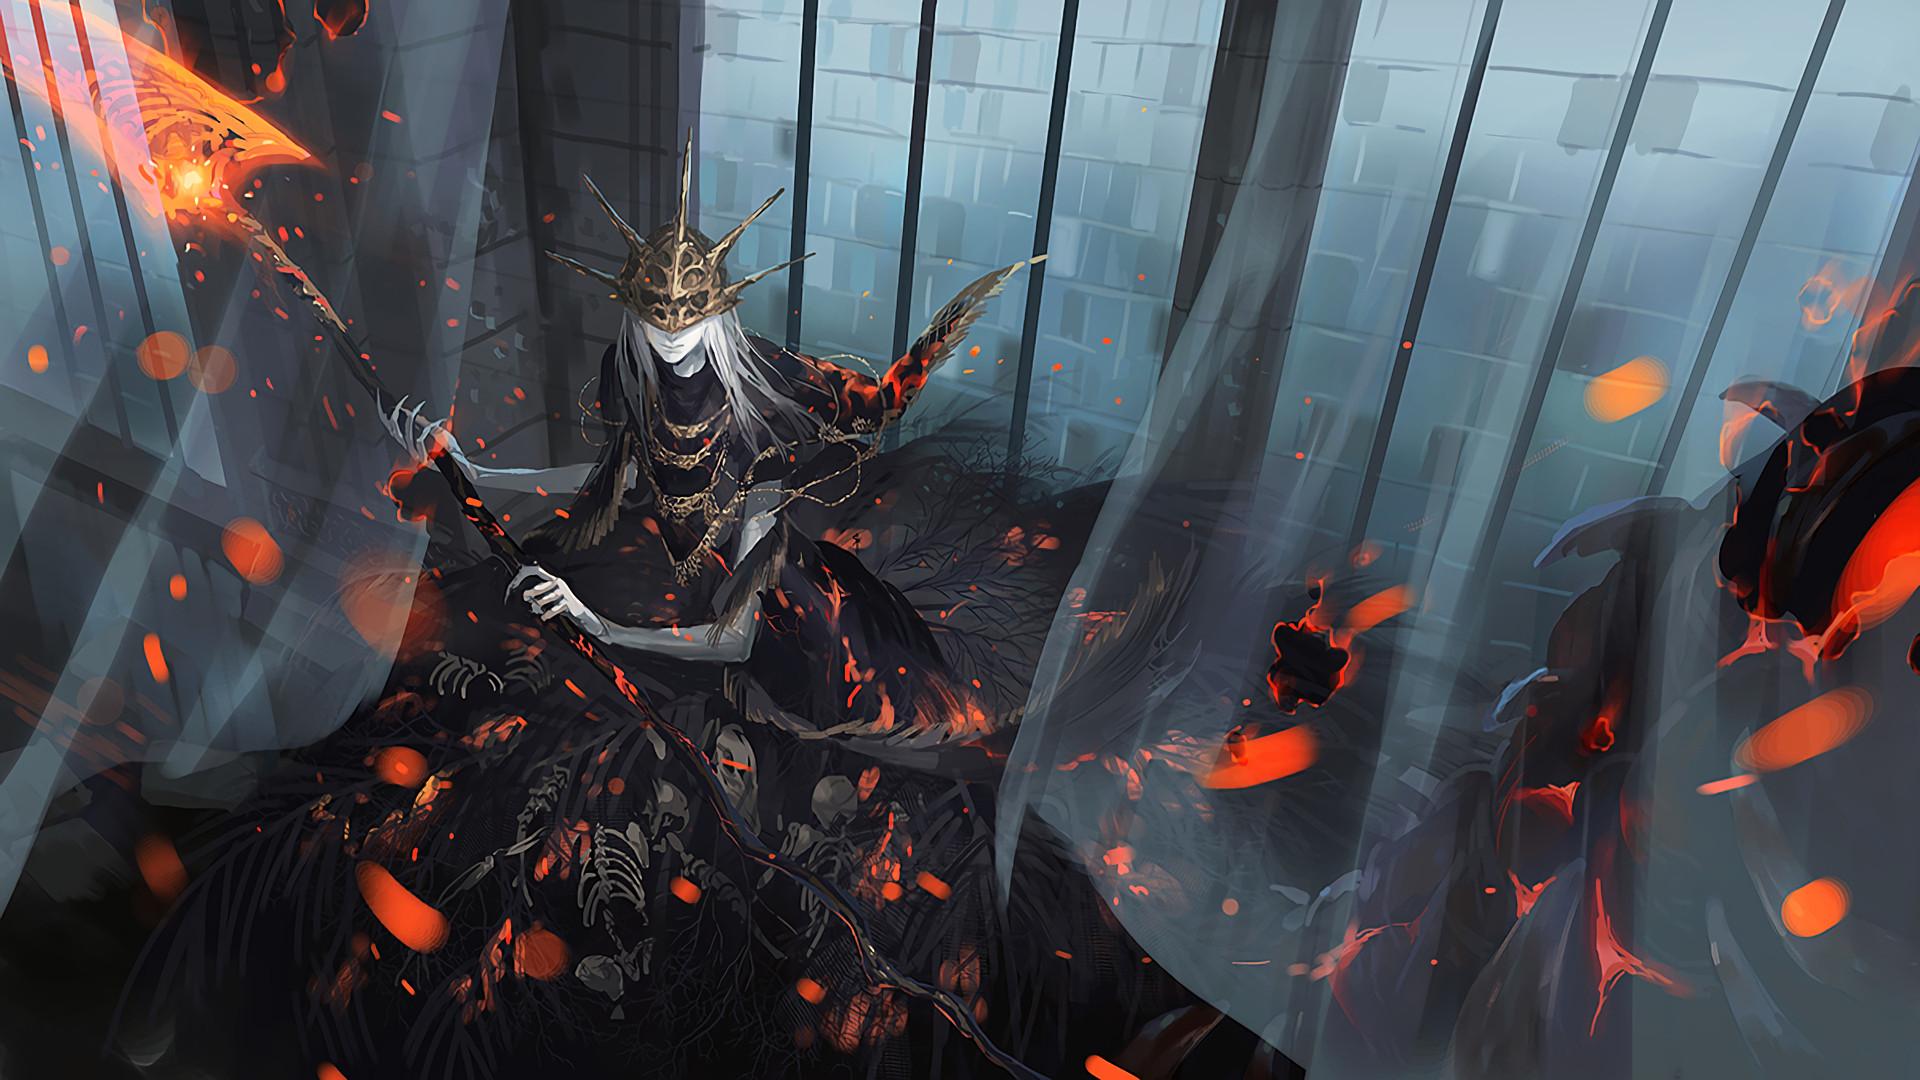 Dark Souls and Bloodborne wallpaper dump (Spoilers ahead)